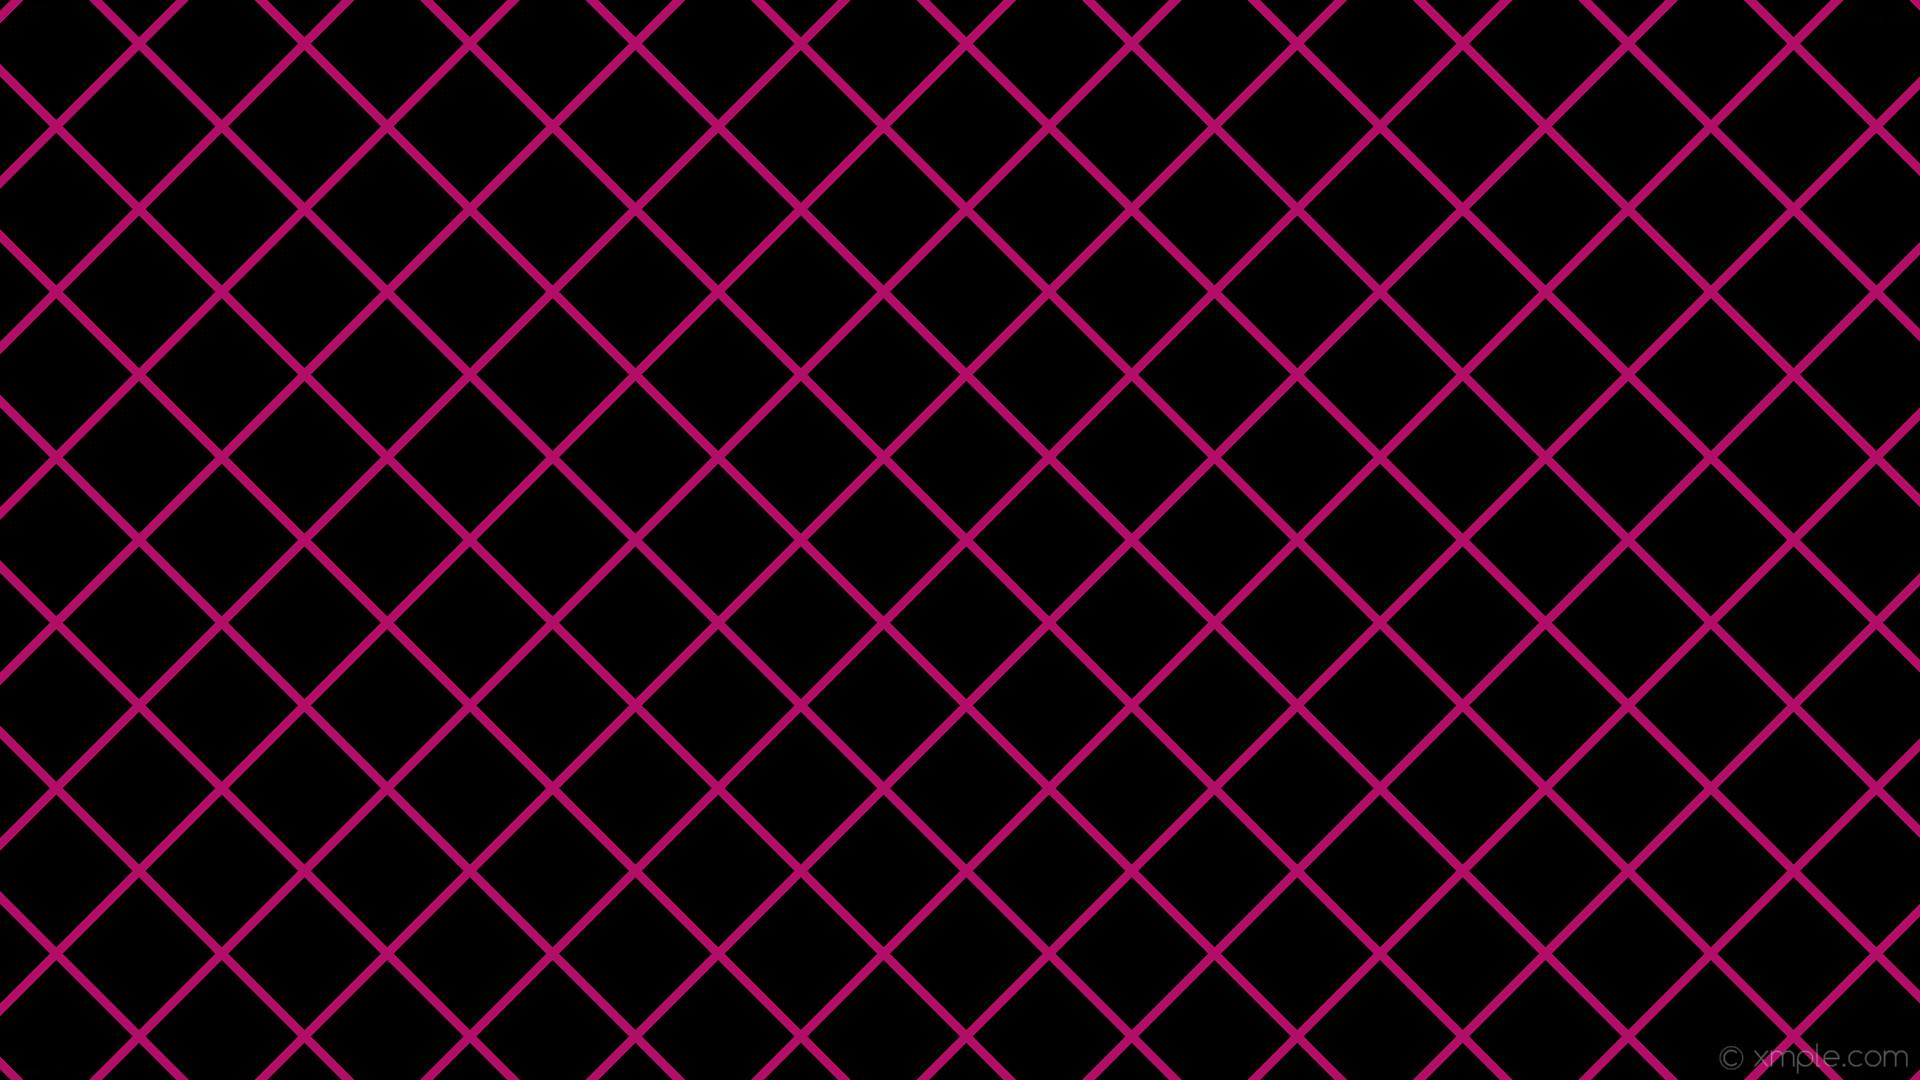 wallpaper black pink graph paper grid deep pink #000000 #ff1493 45° 9px  117px